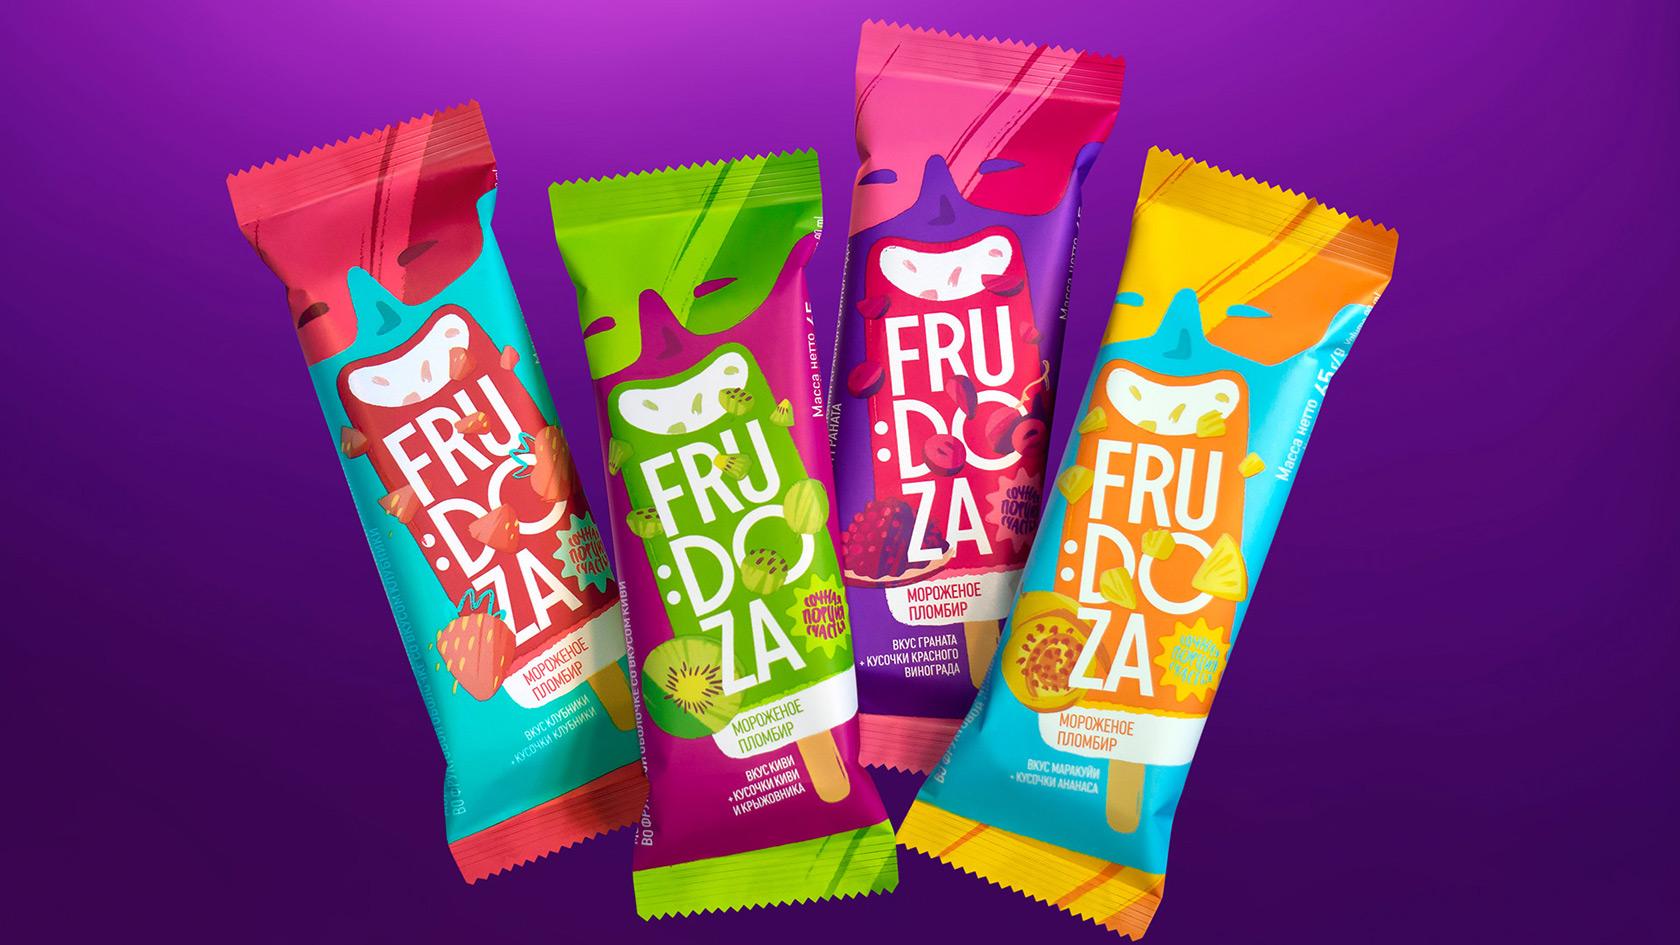 Frudoza Fruit Ice Cream Packaging Redesign by Brama Branding